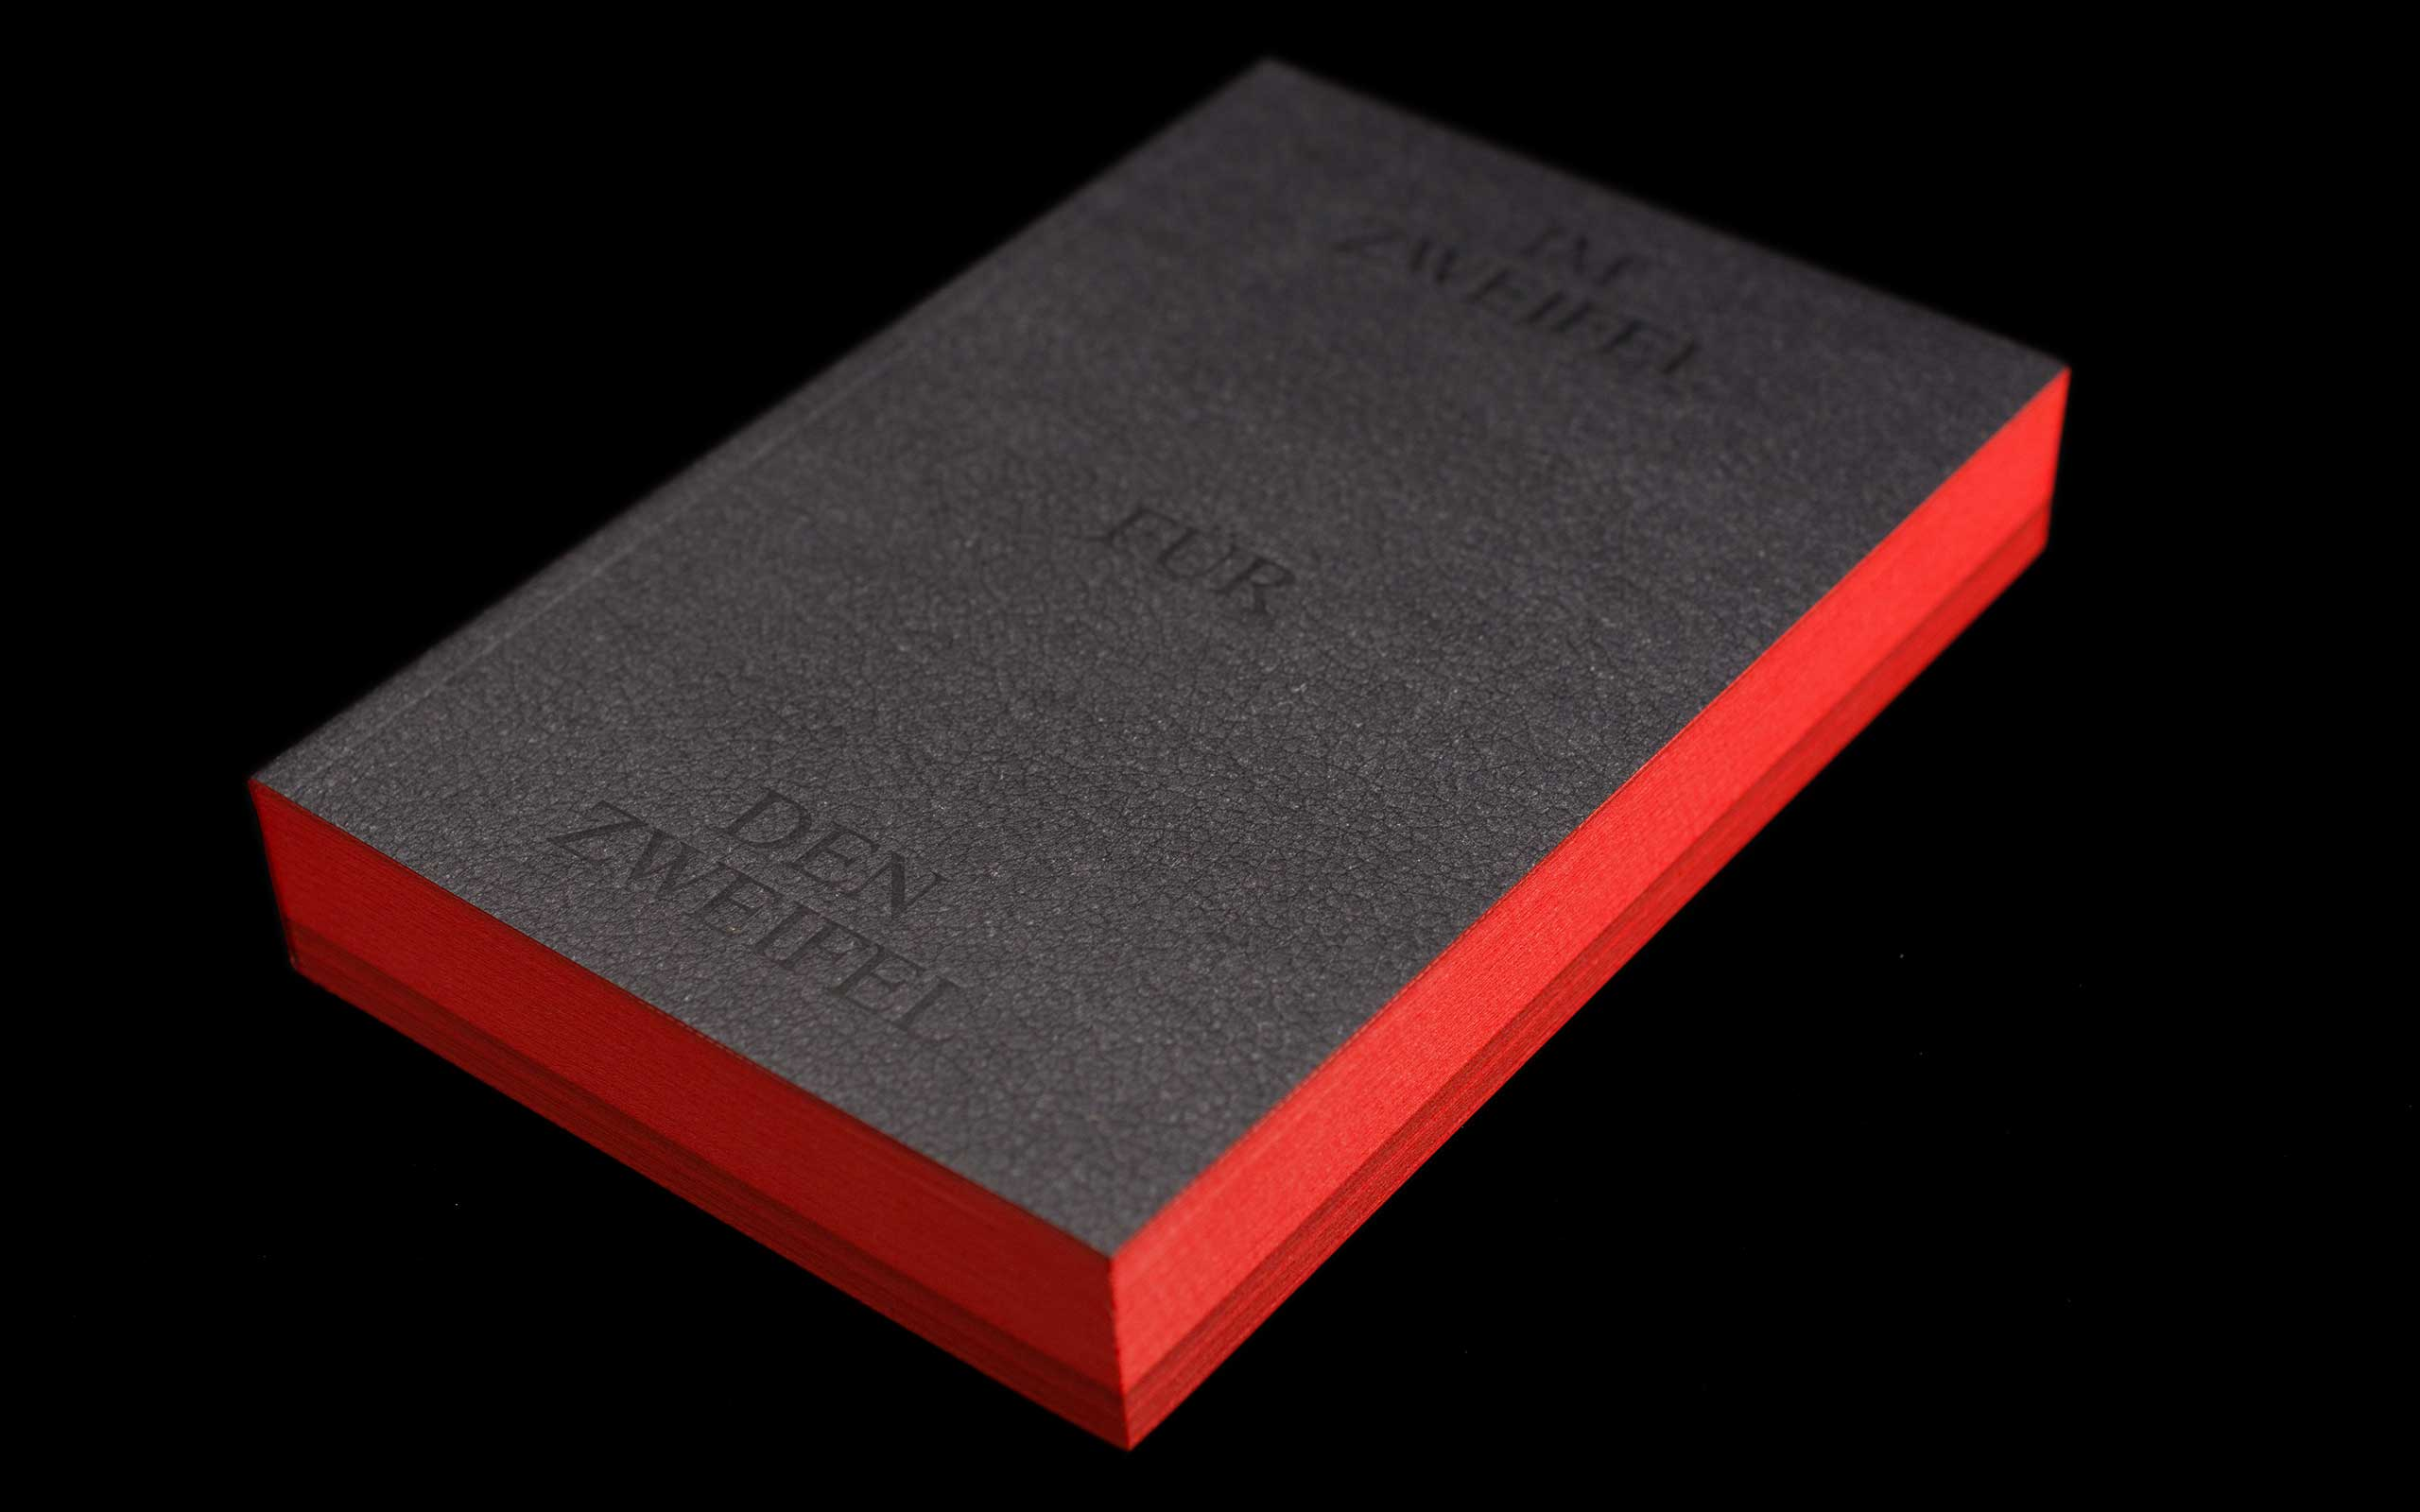 IZFDZ_Buch-cover-1